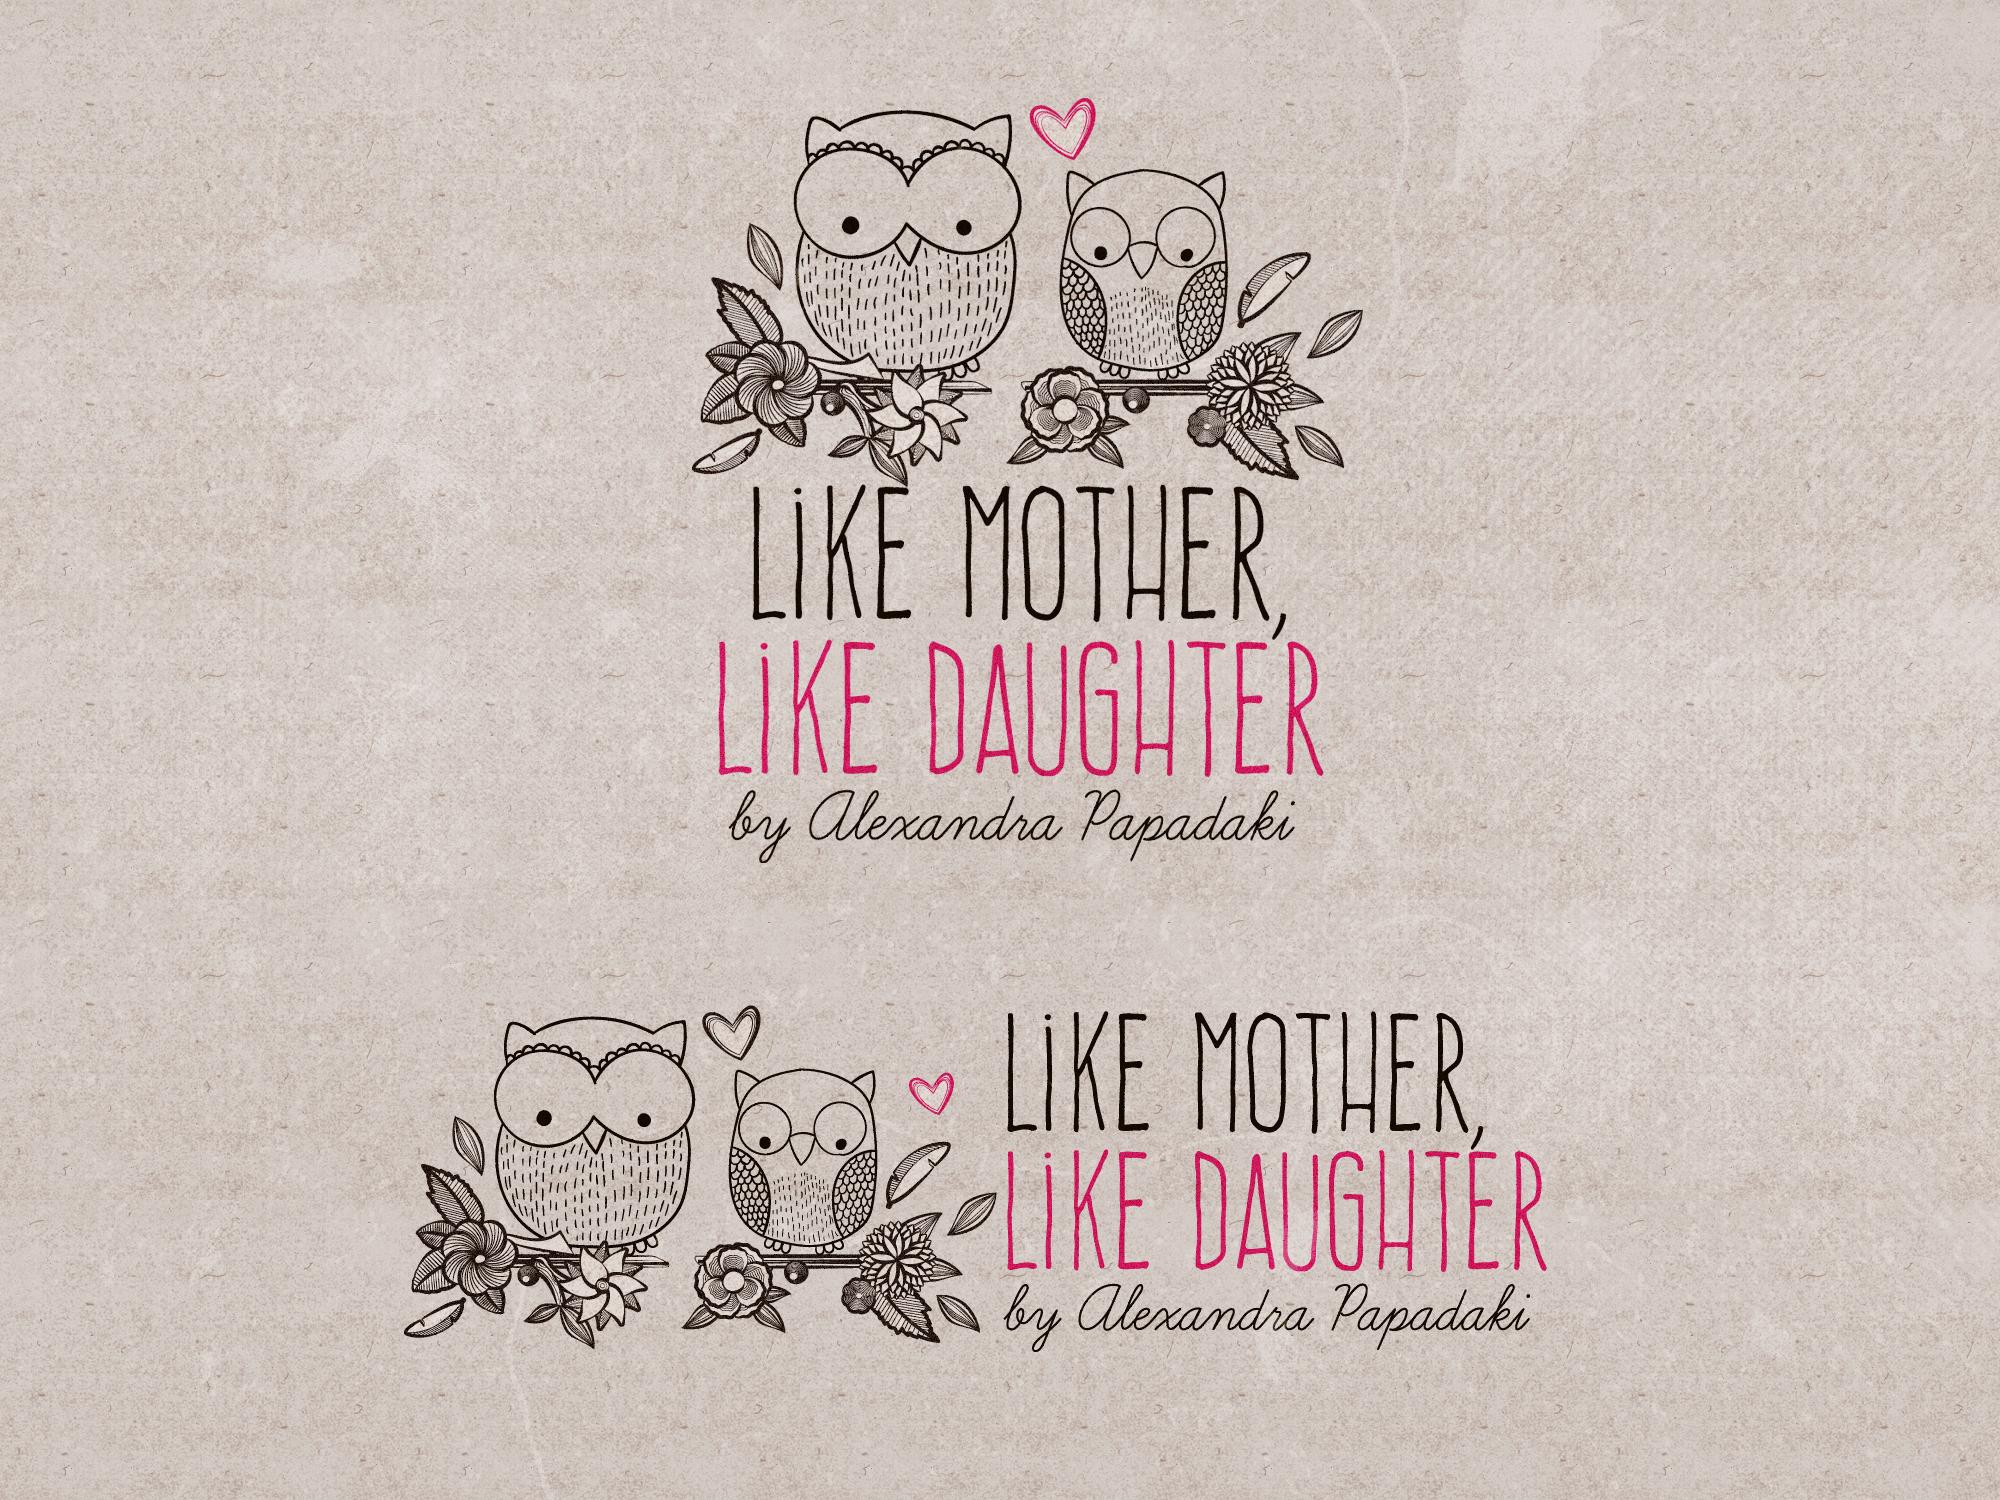 Like mother, like daughter blog